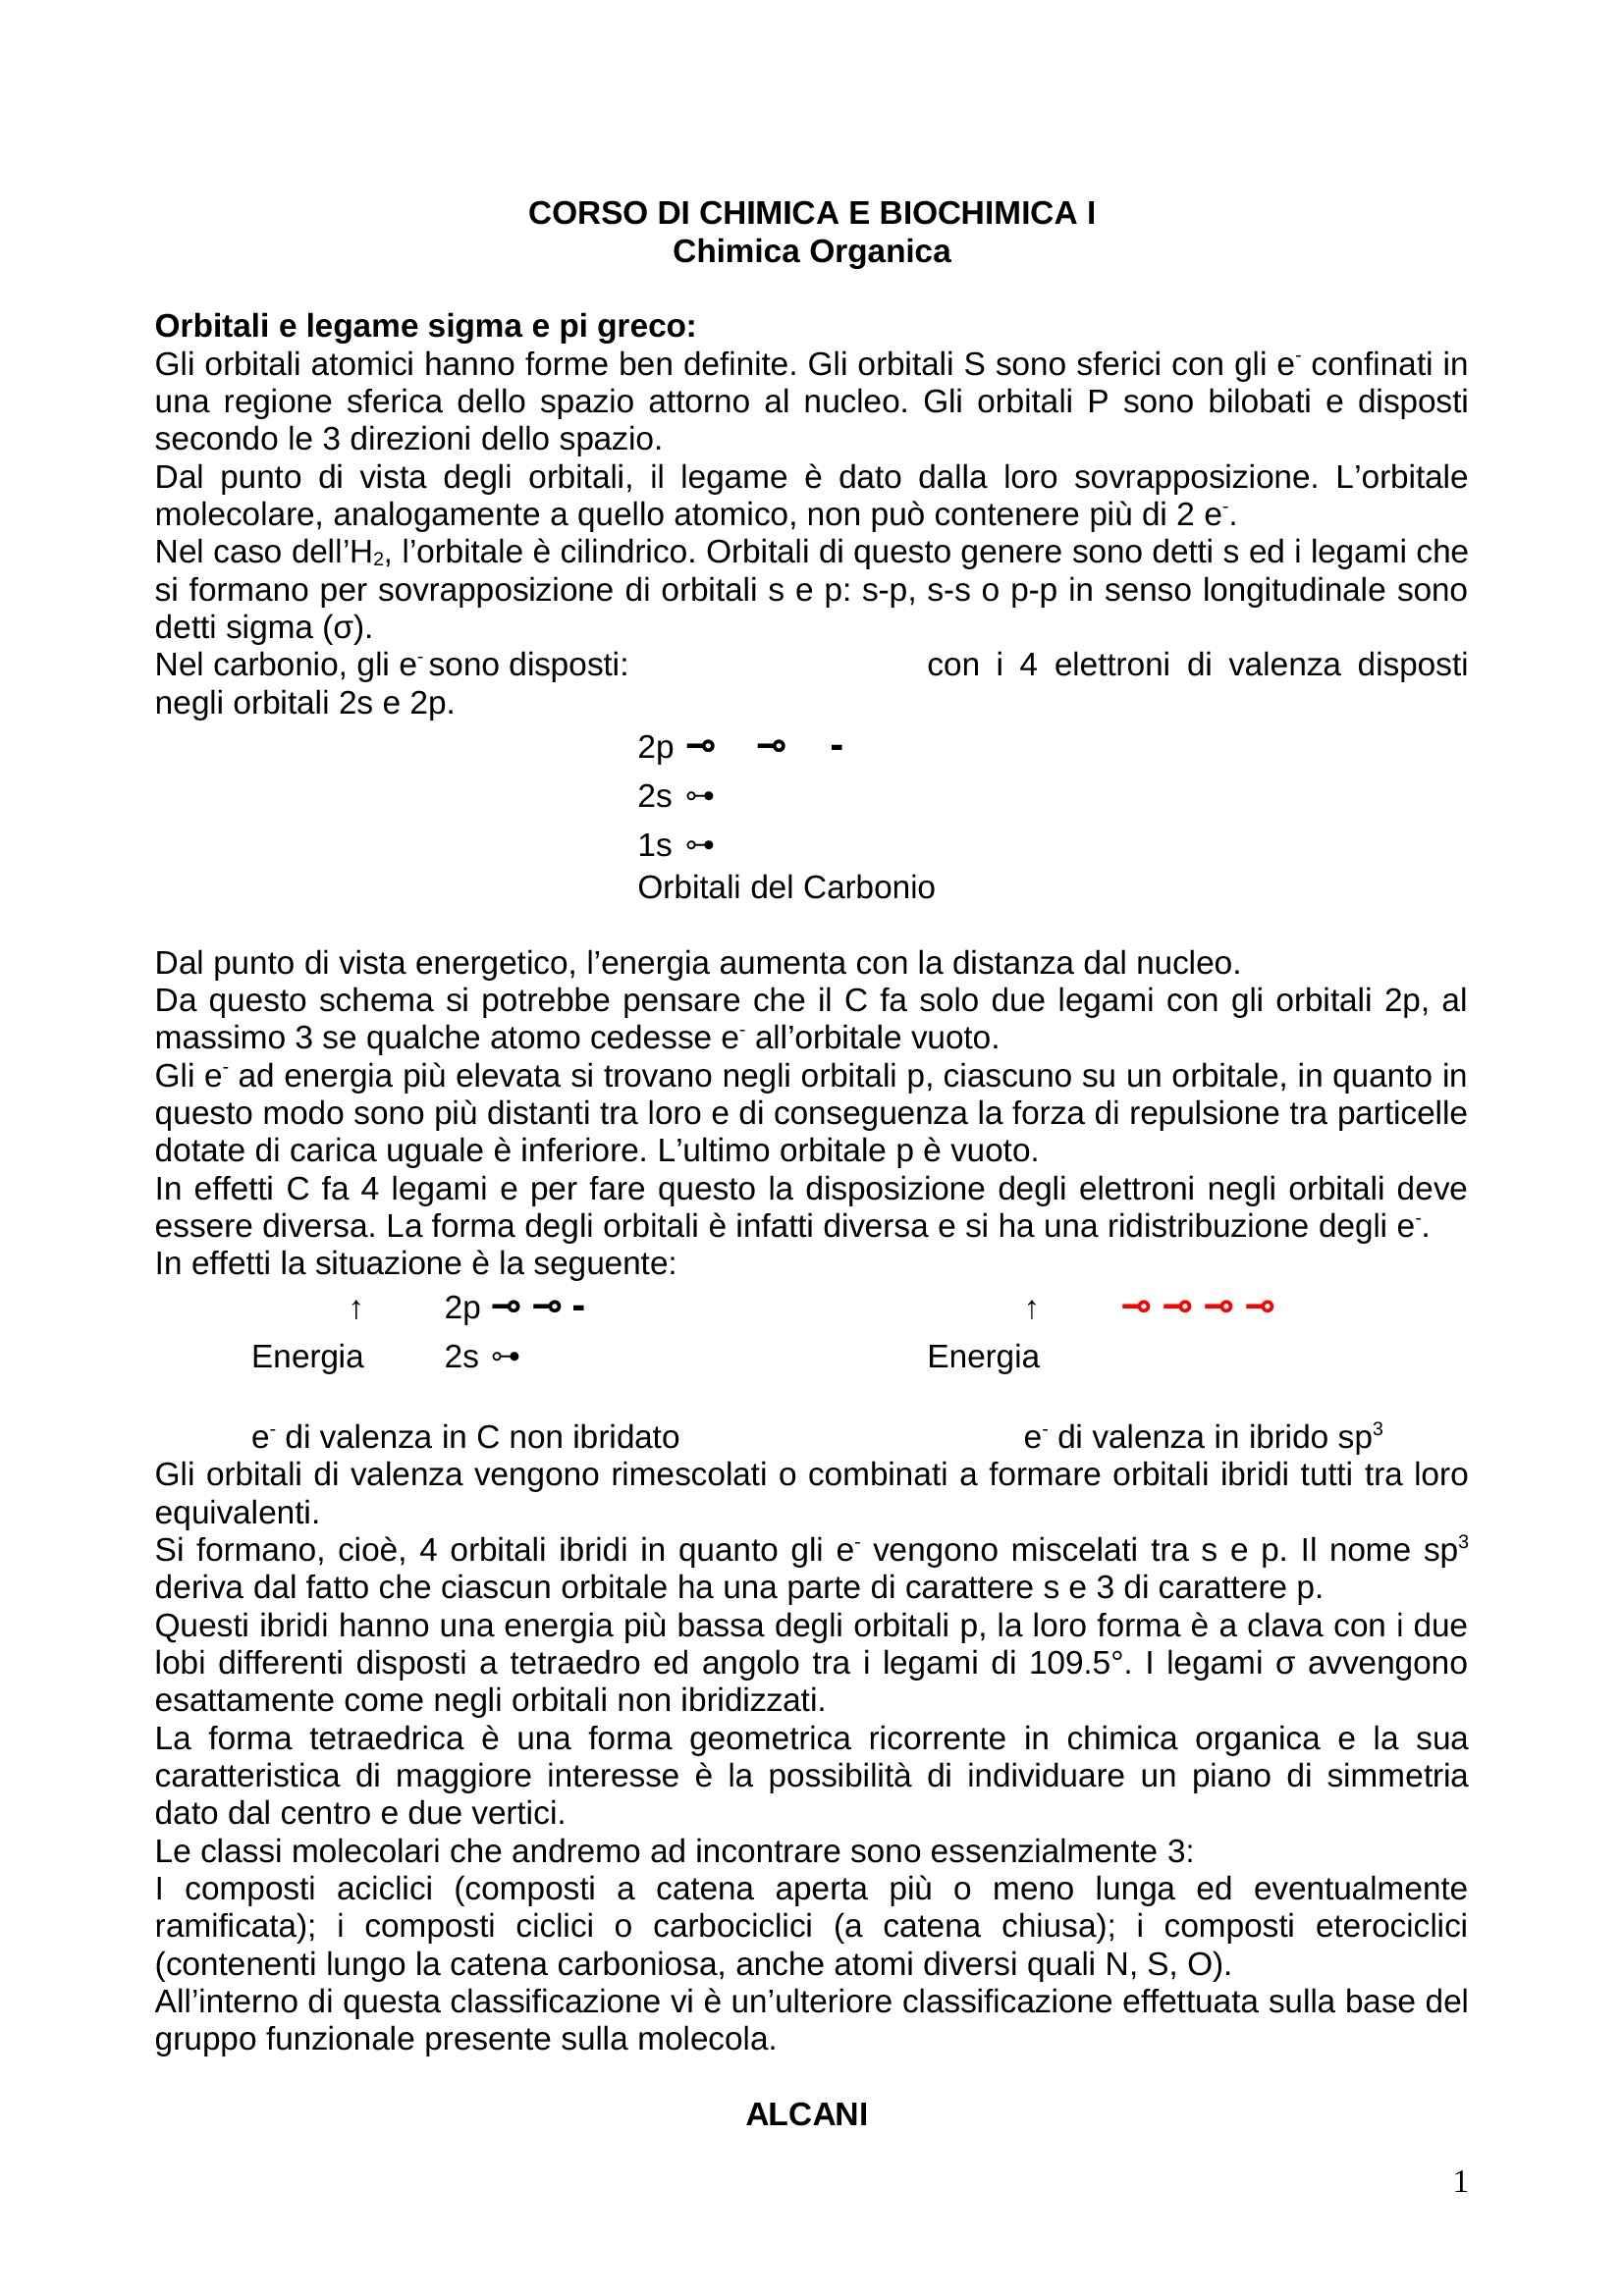 Chimica organica - Riassunto esame generale